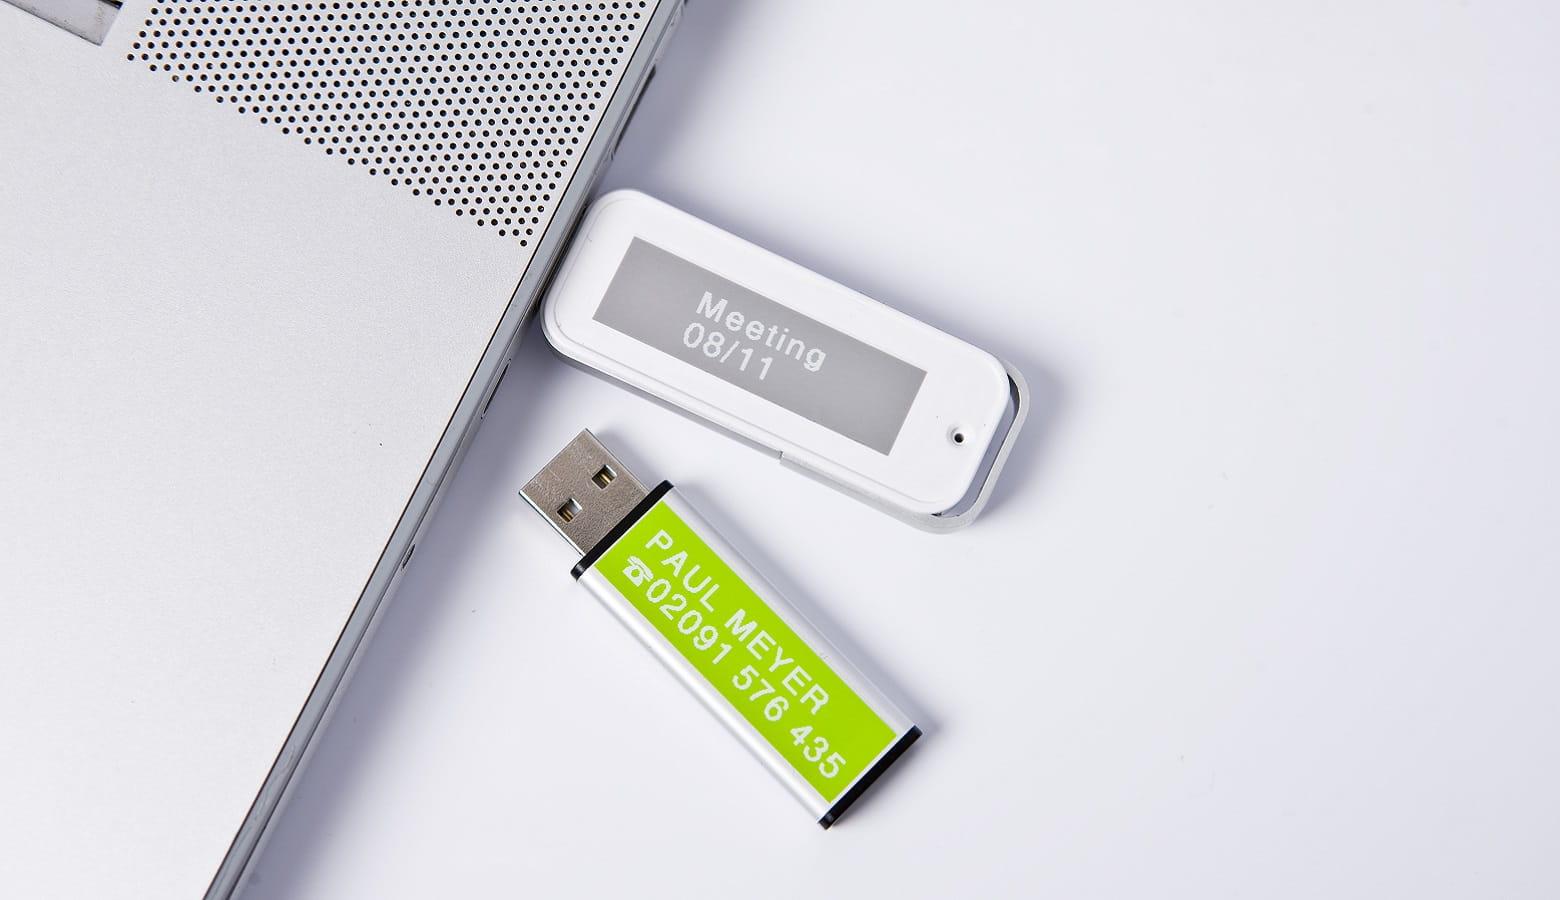 Chiavette USB etichettate